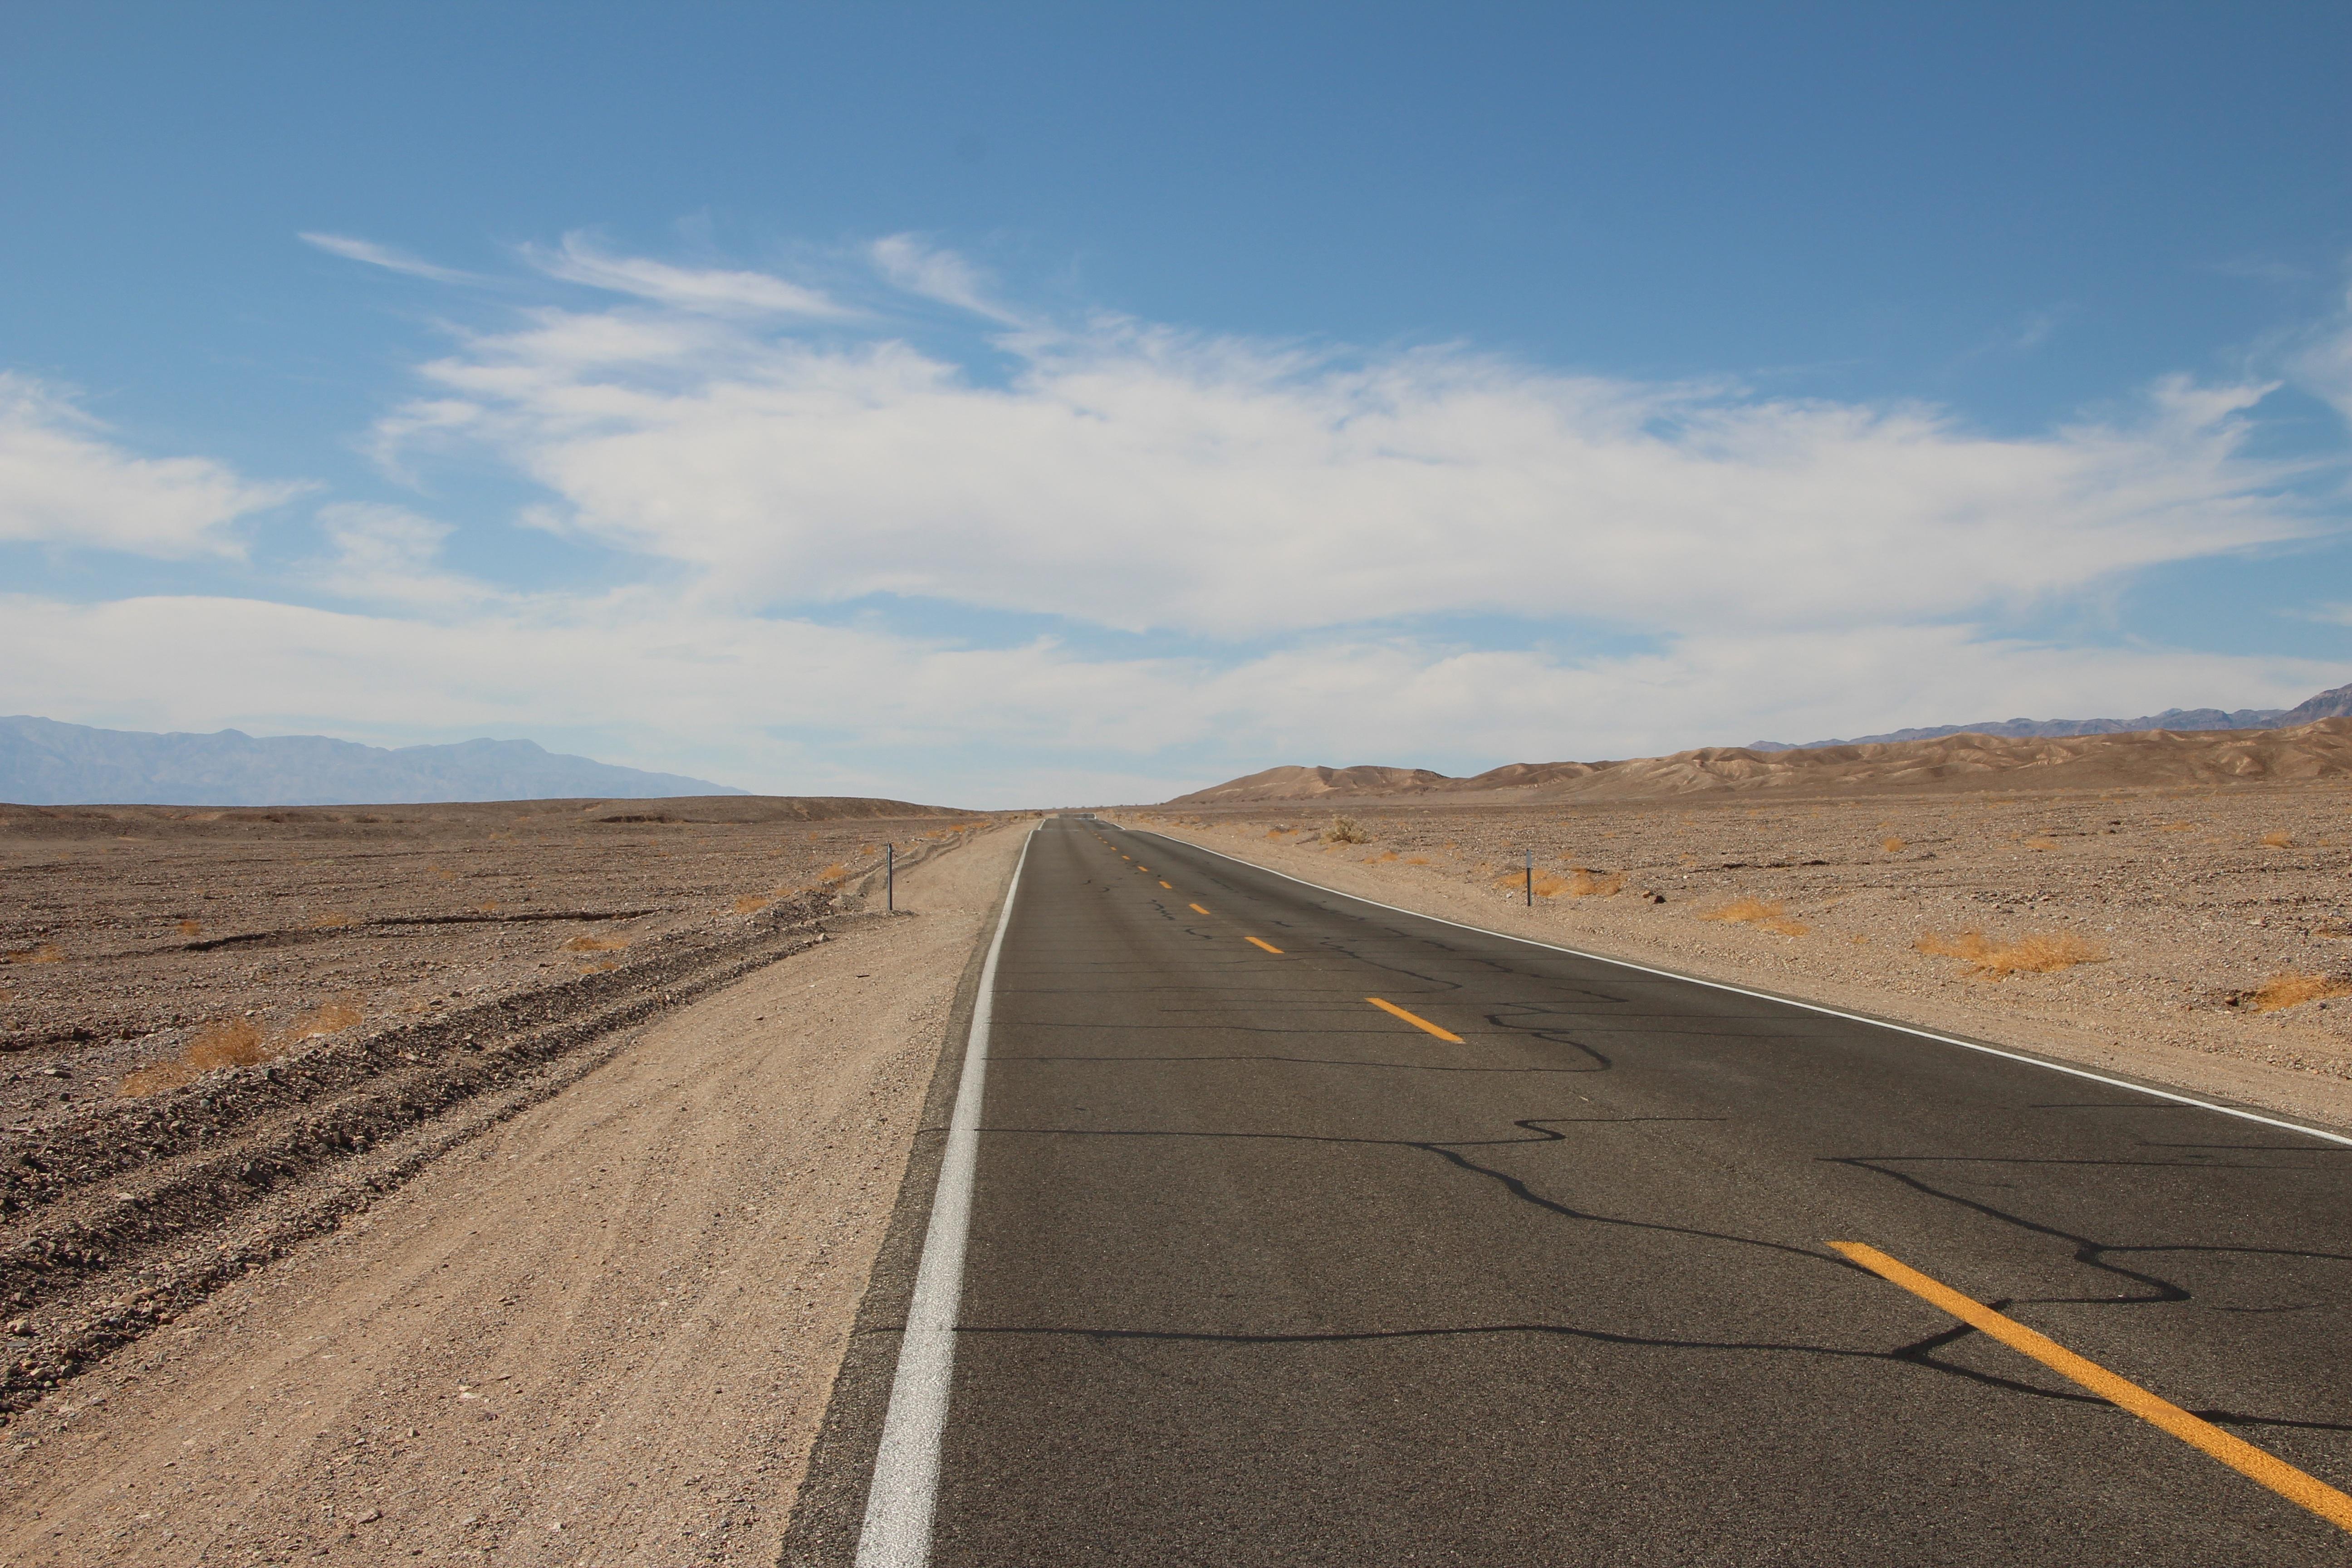 Free Images : landscape, sand, horizon, mountain, street ...